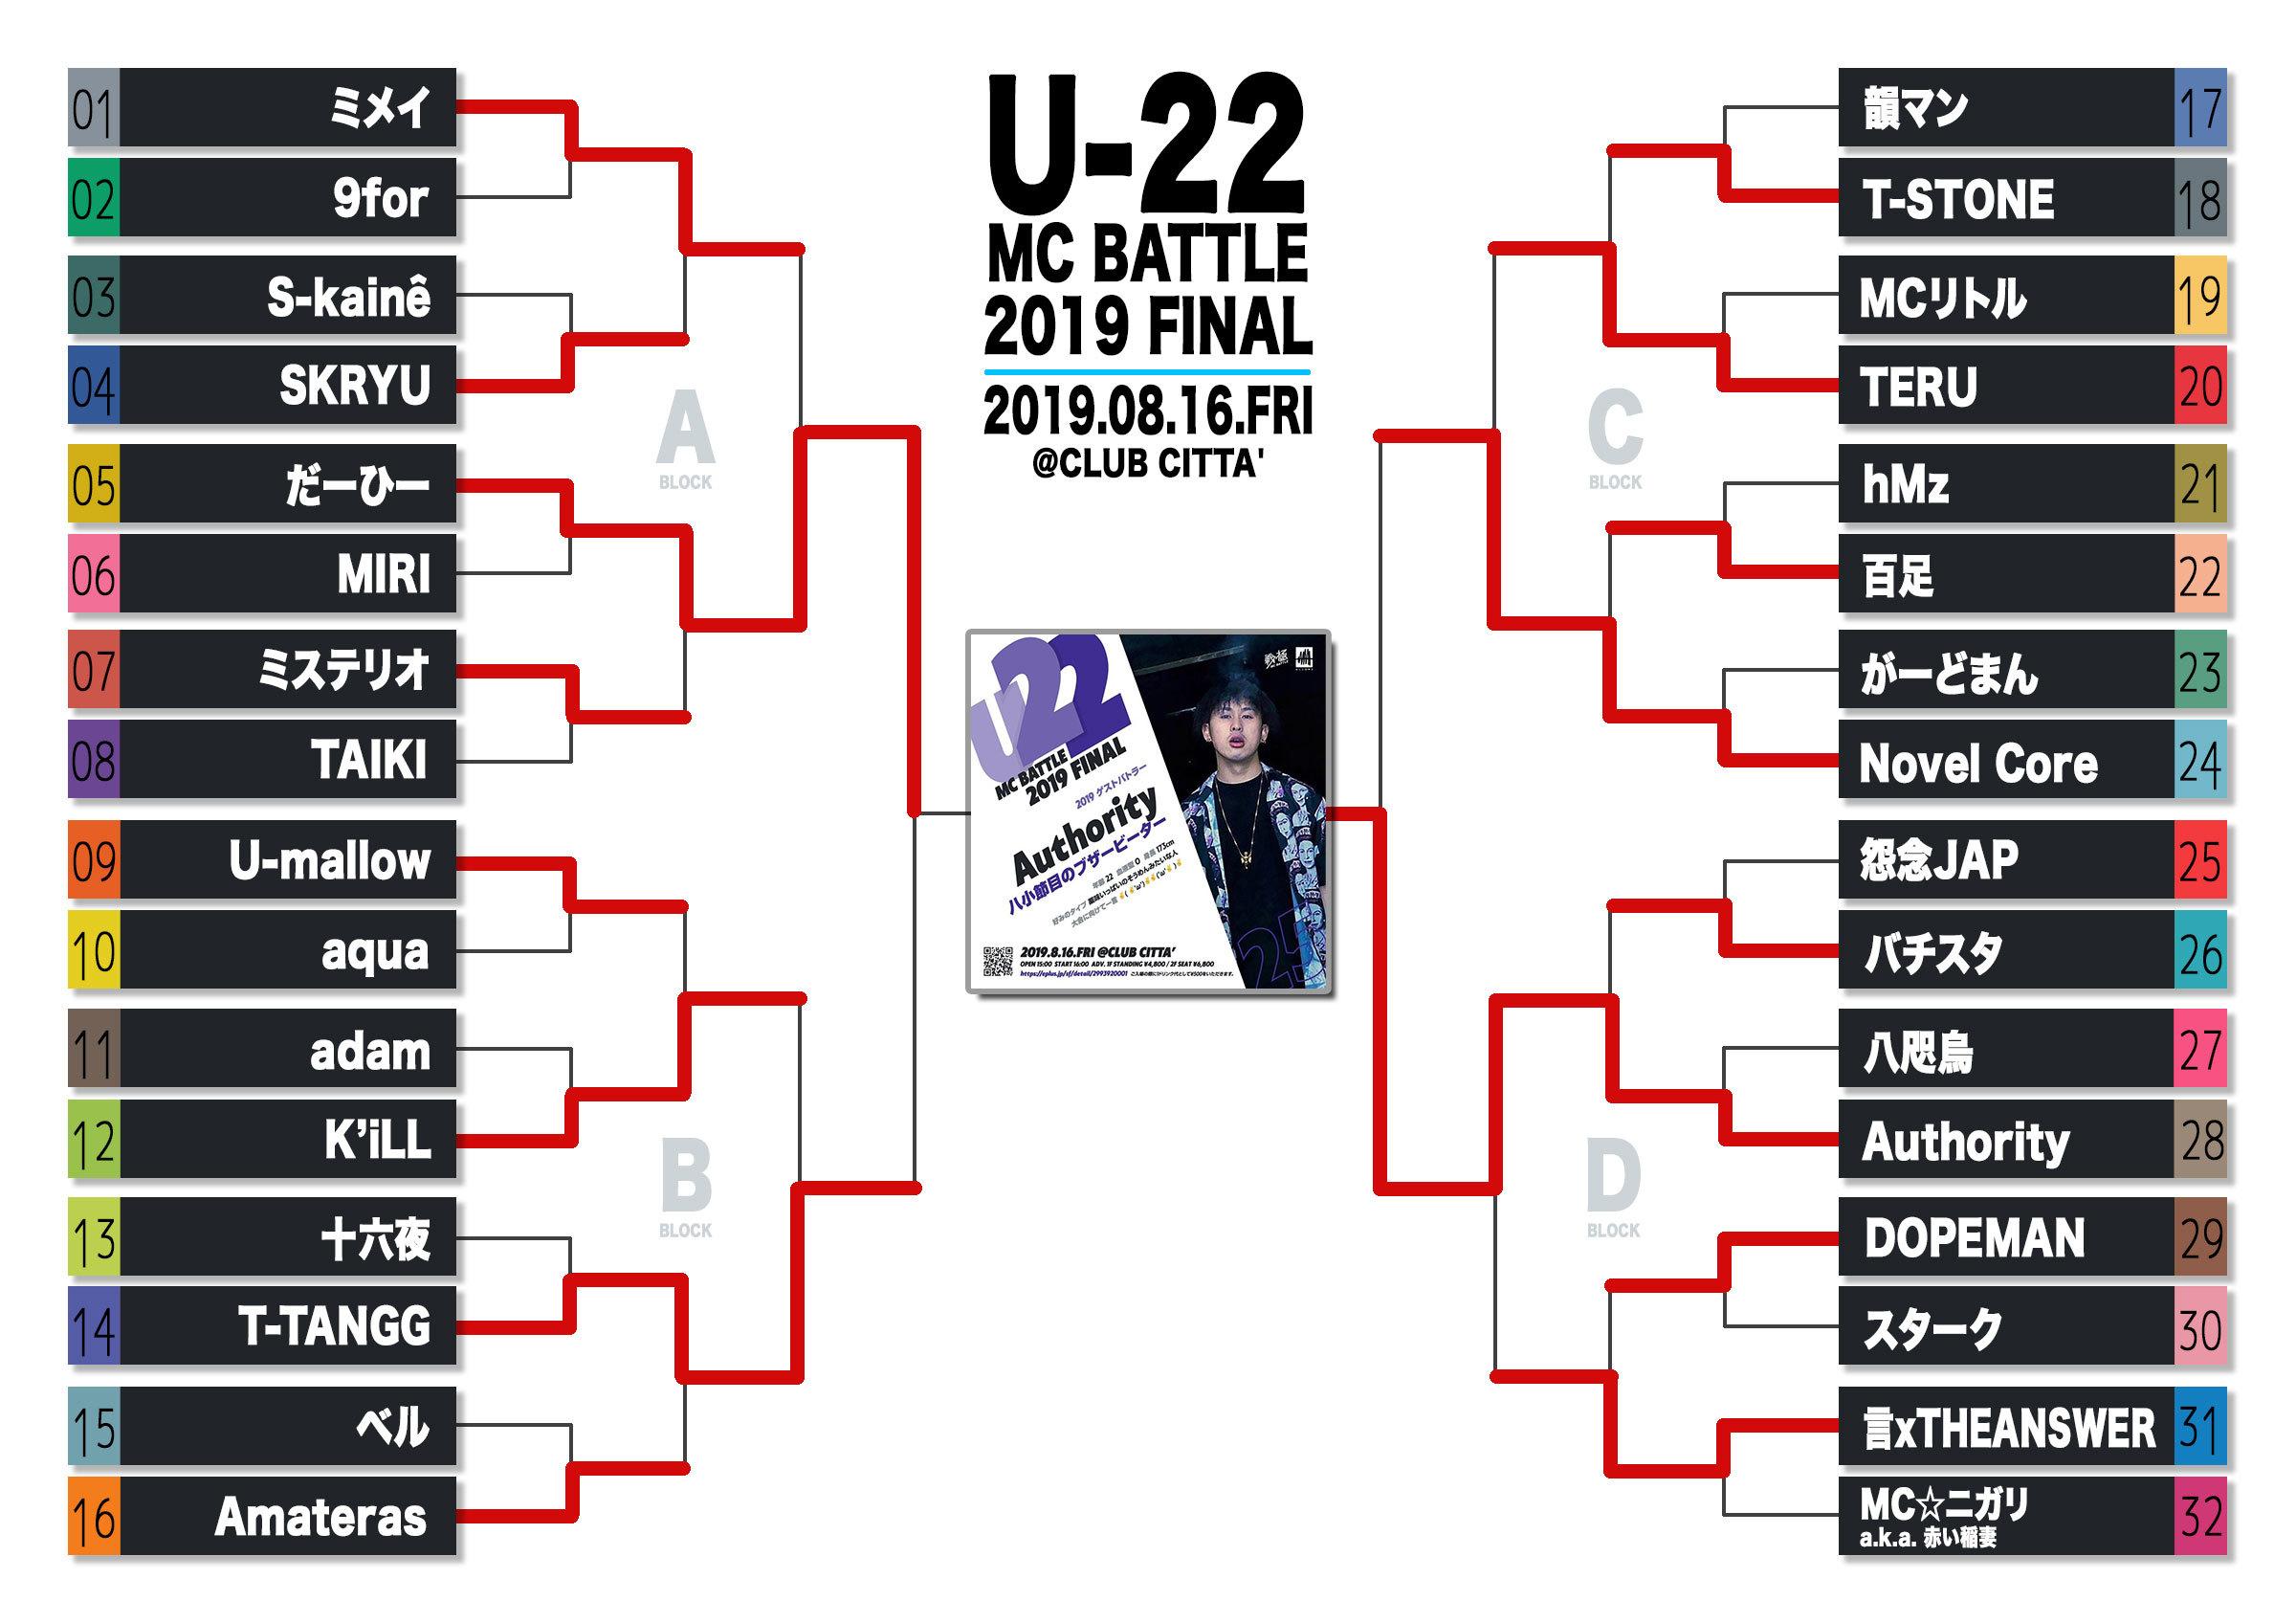 8/16 U-22 MCBATTLE 2019 FINAL 優勝は..._e0246863_14404386.jpg